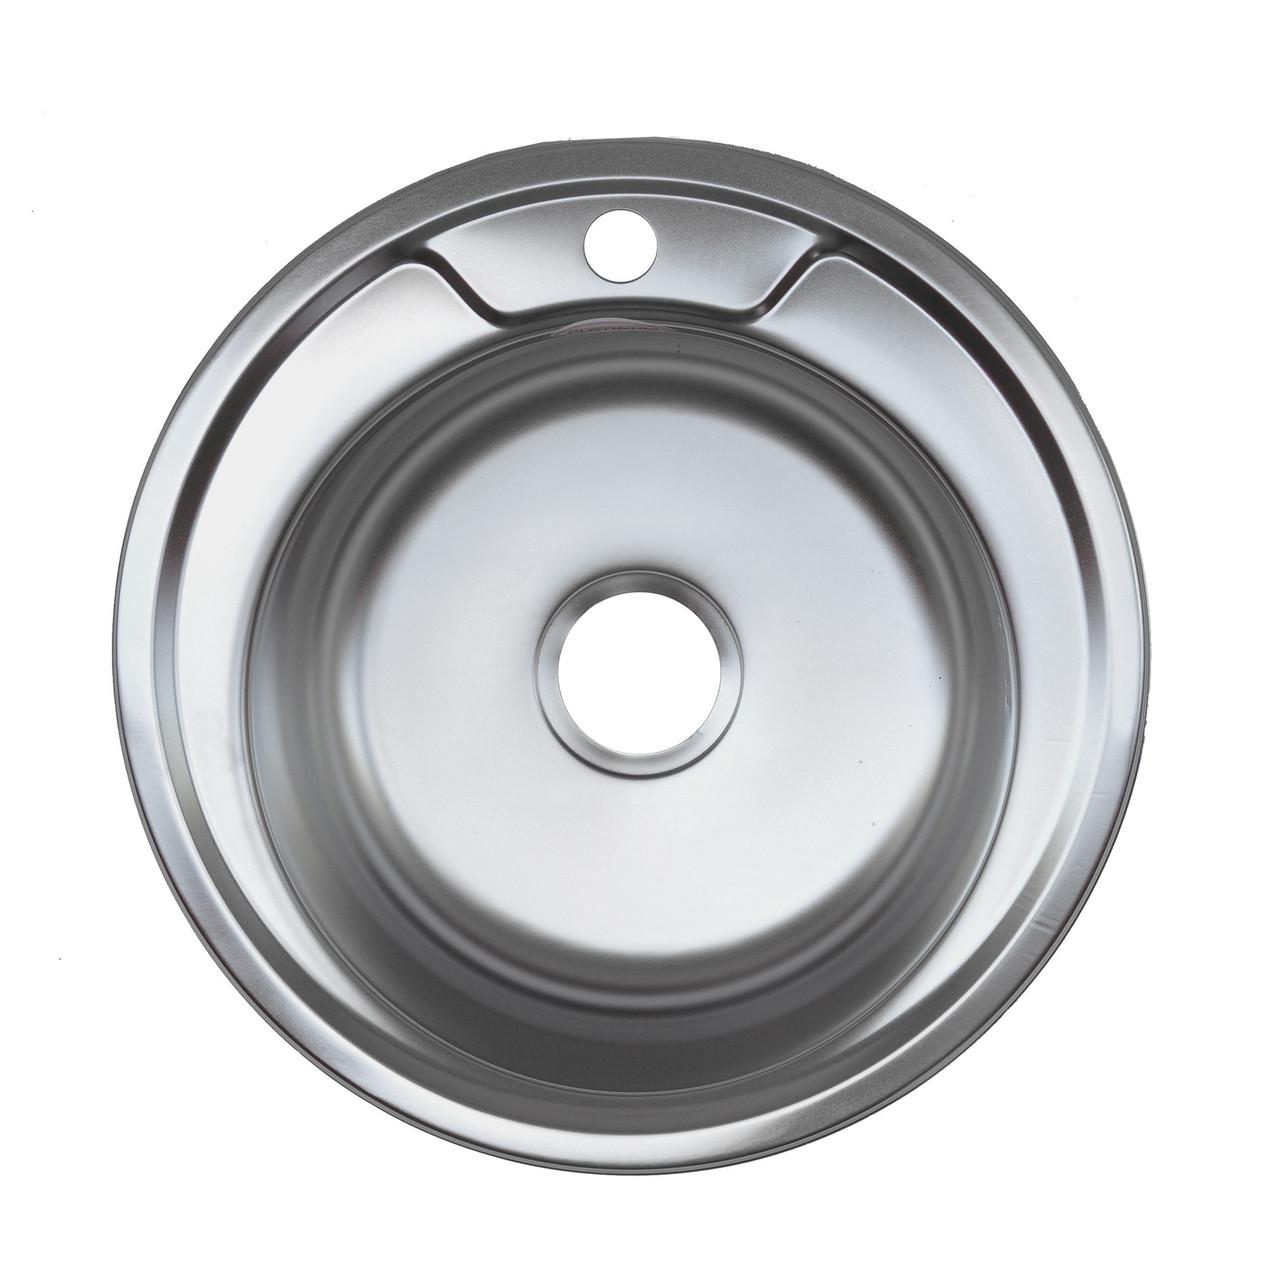 Мойка кухонная Platinum 490 Satin 0,6мм круглая матовая